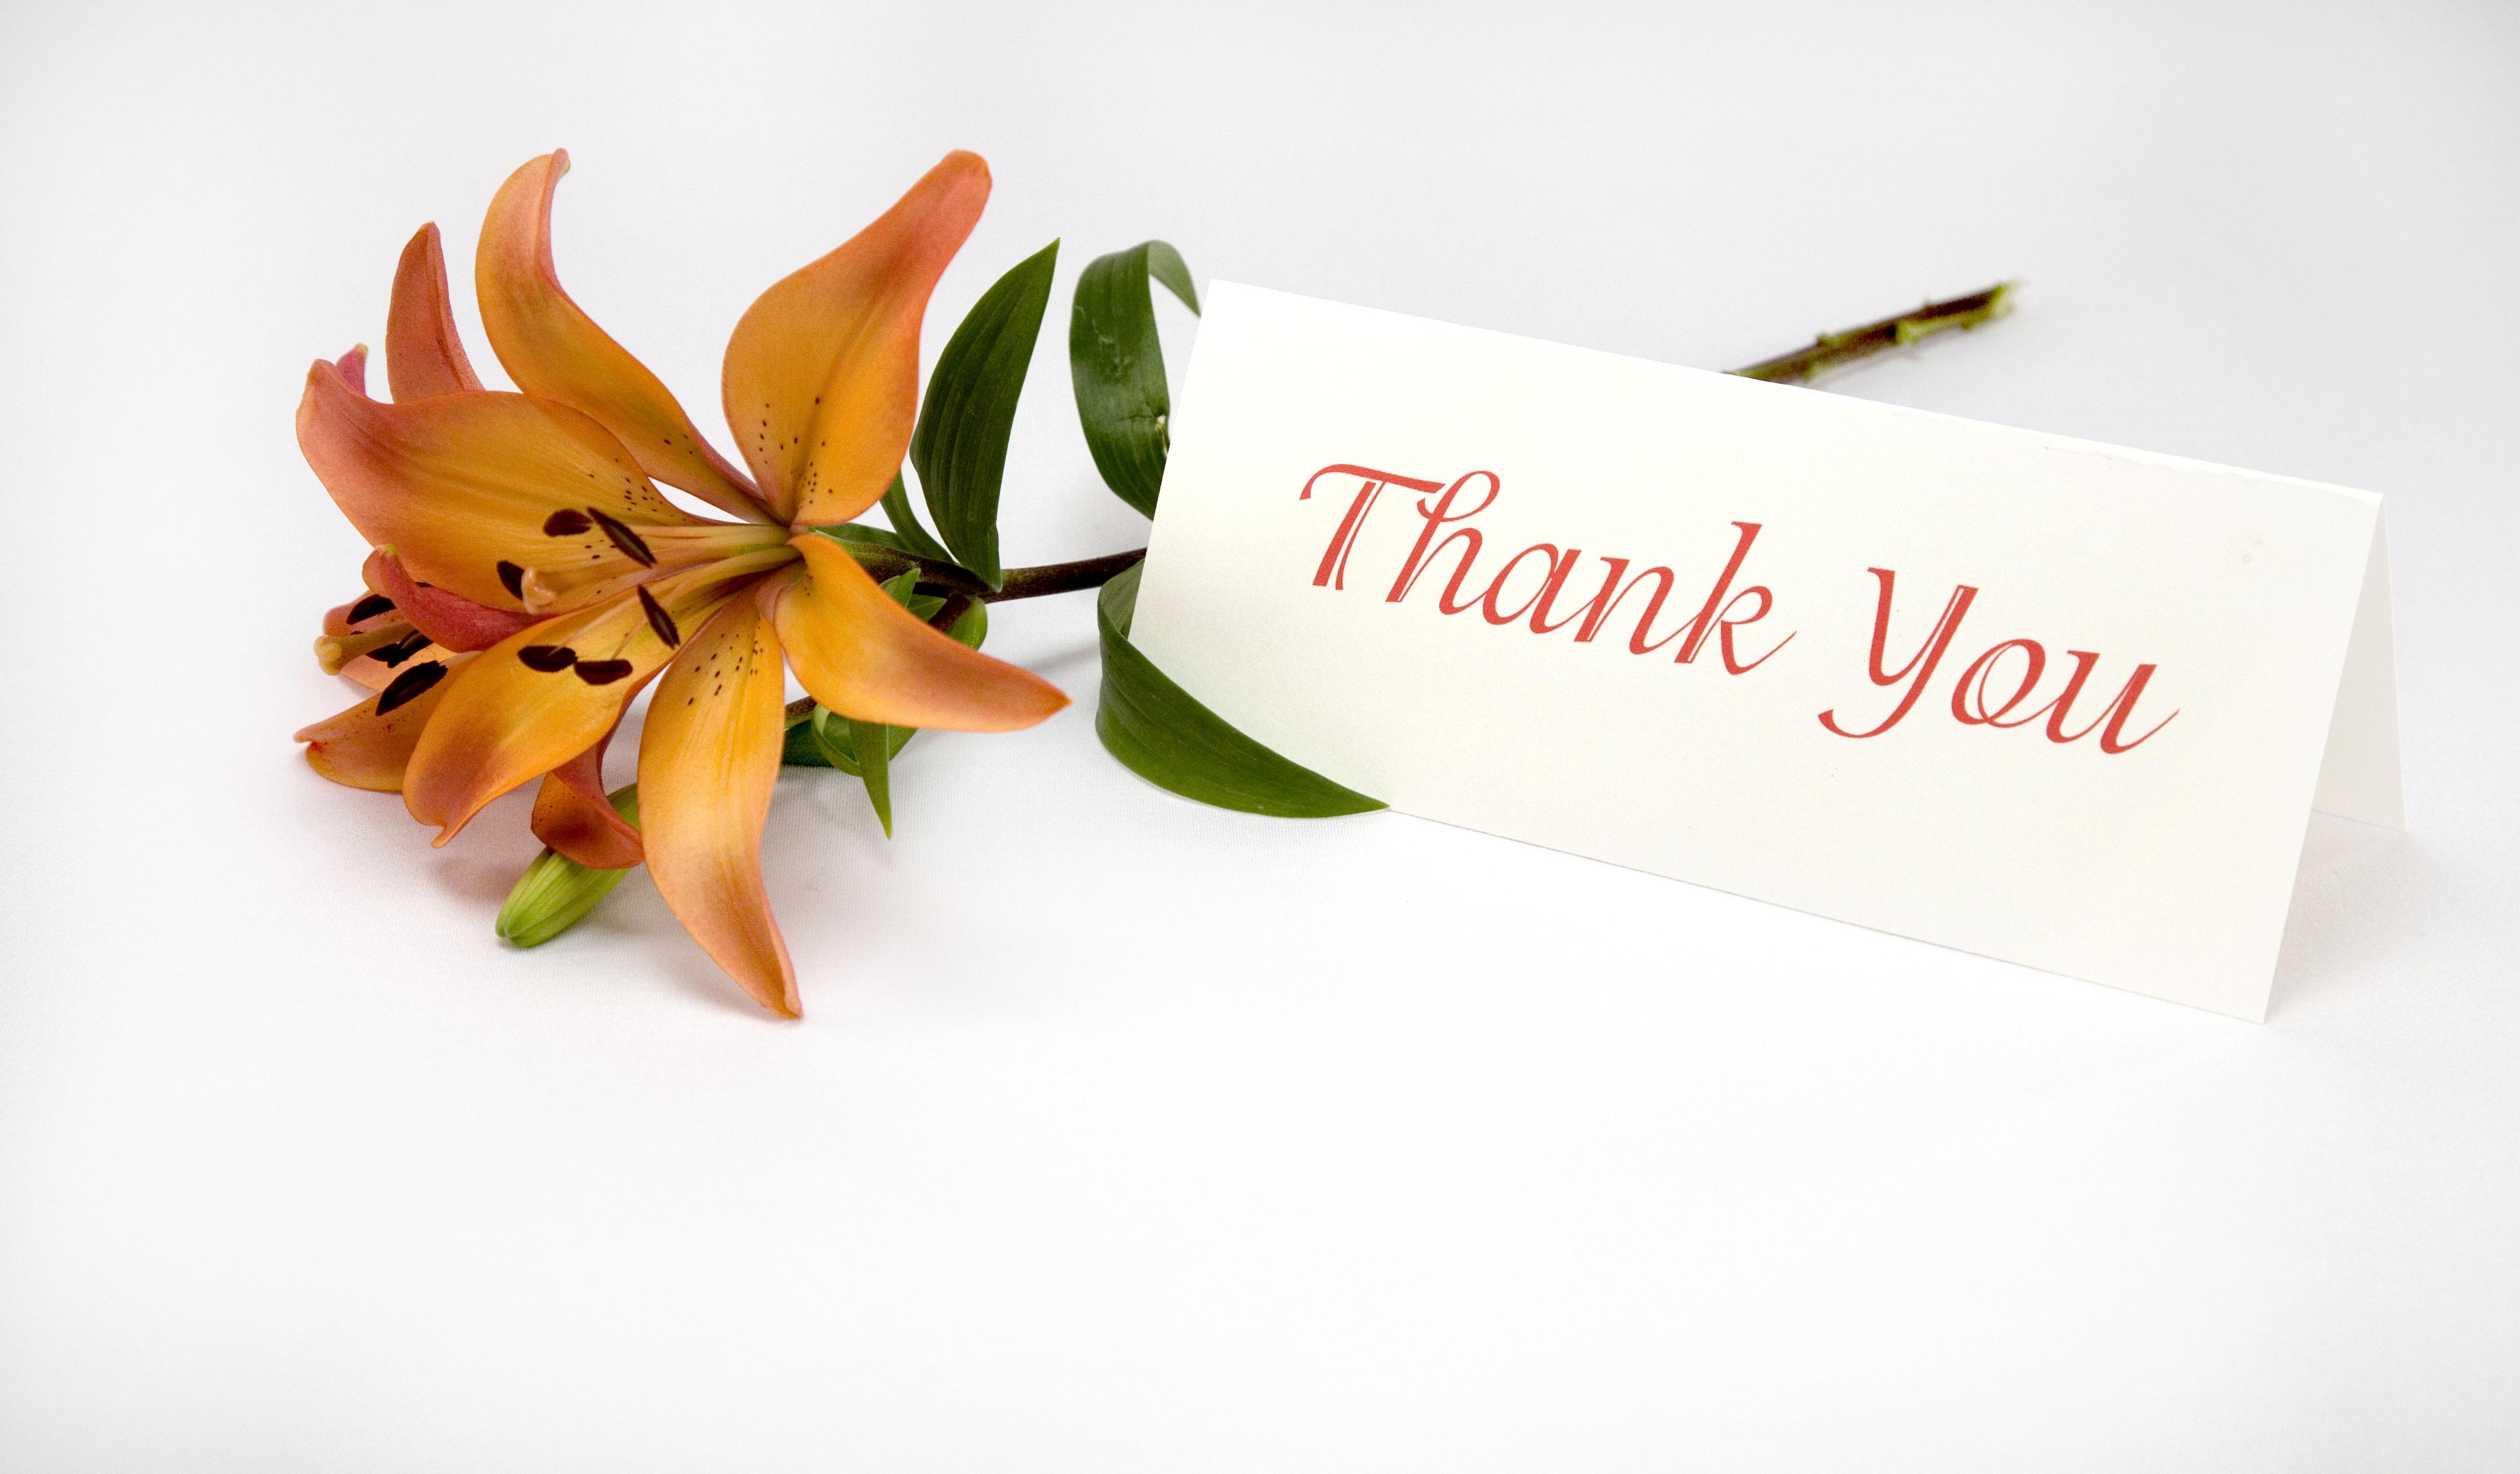 Give thanks author april mcgowan